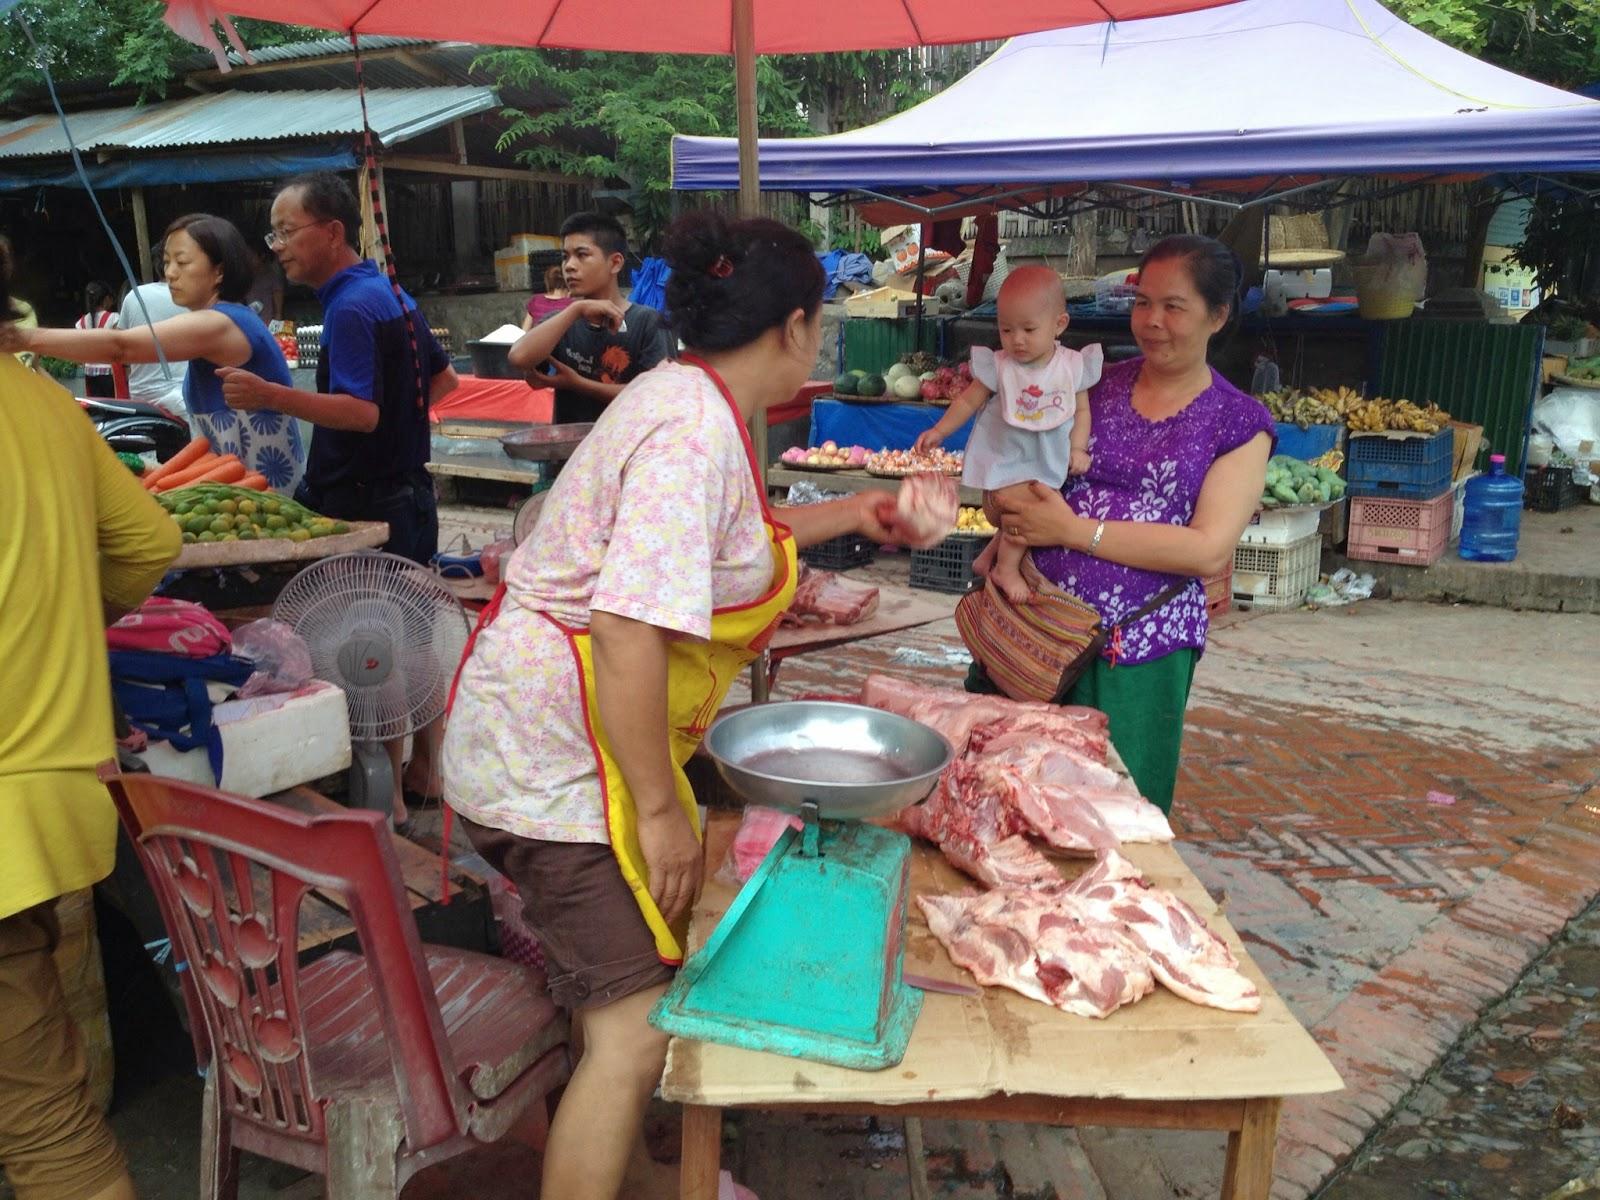 Luang Prabang - Meat vendor at a local outdoor market